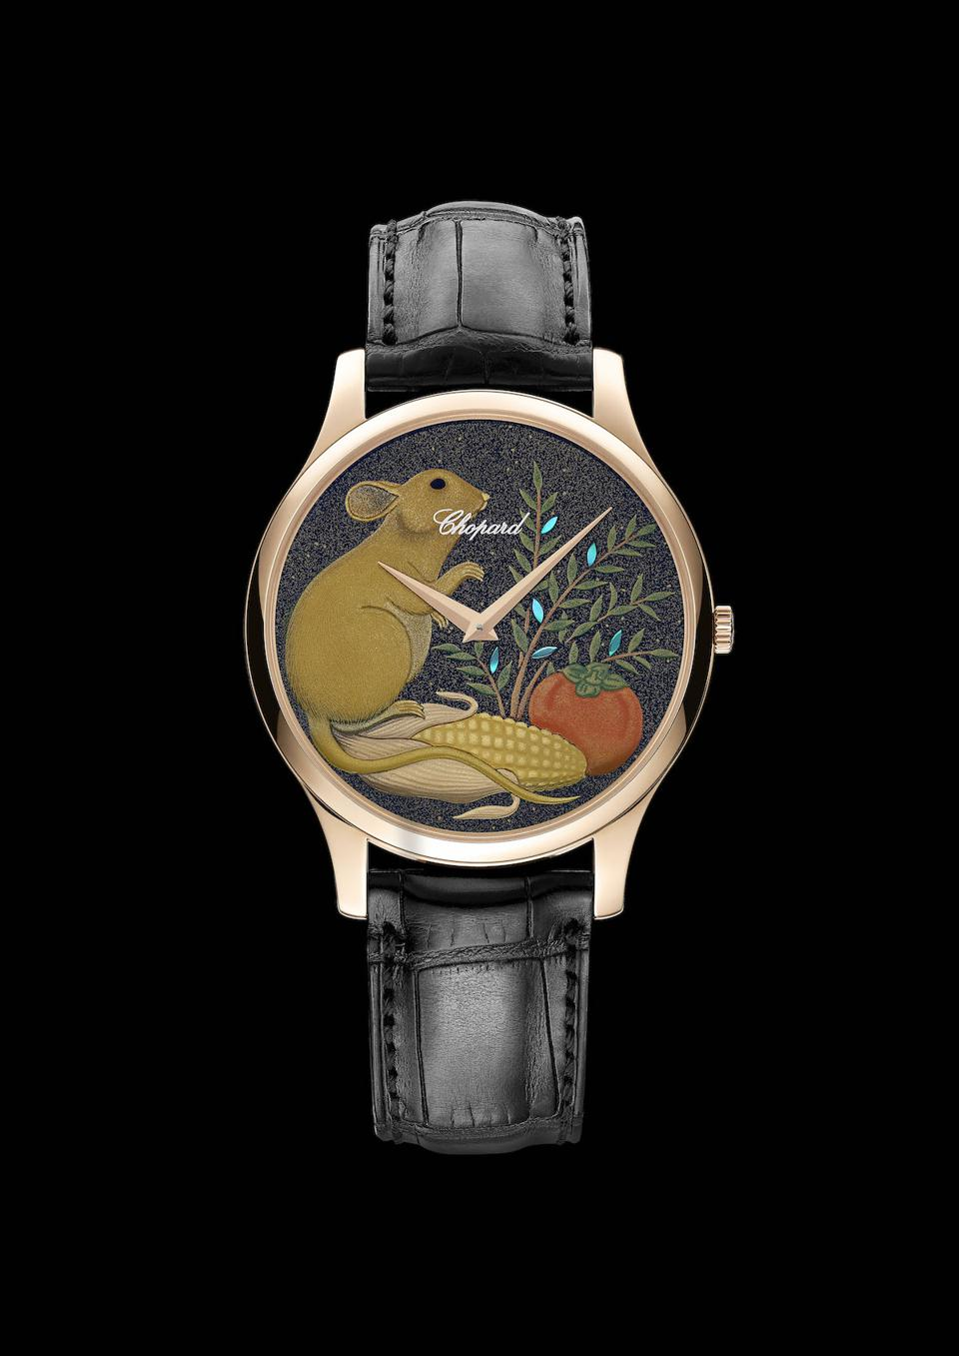 Chopard L.U.C XP Urushi Year of the Rat watch